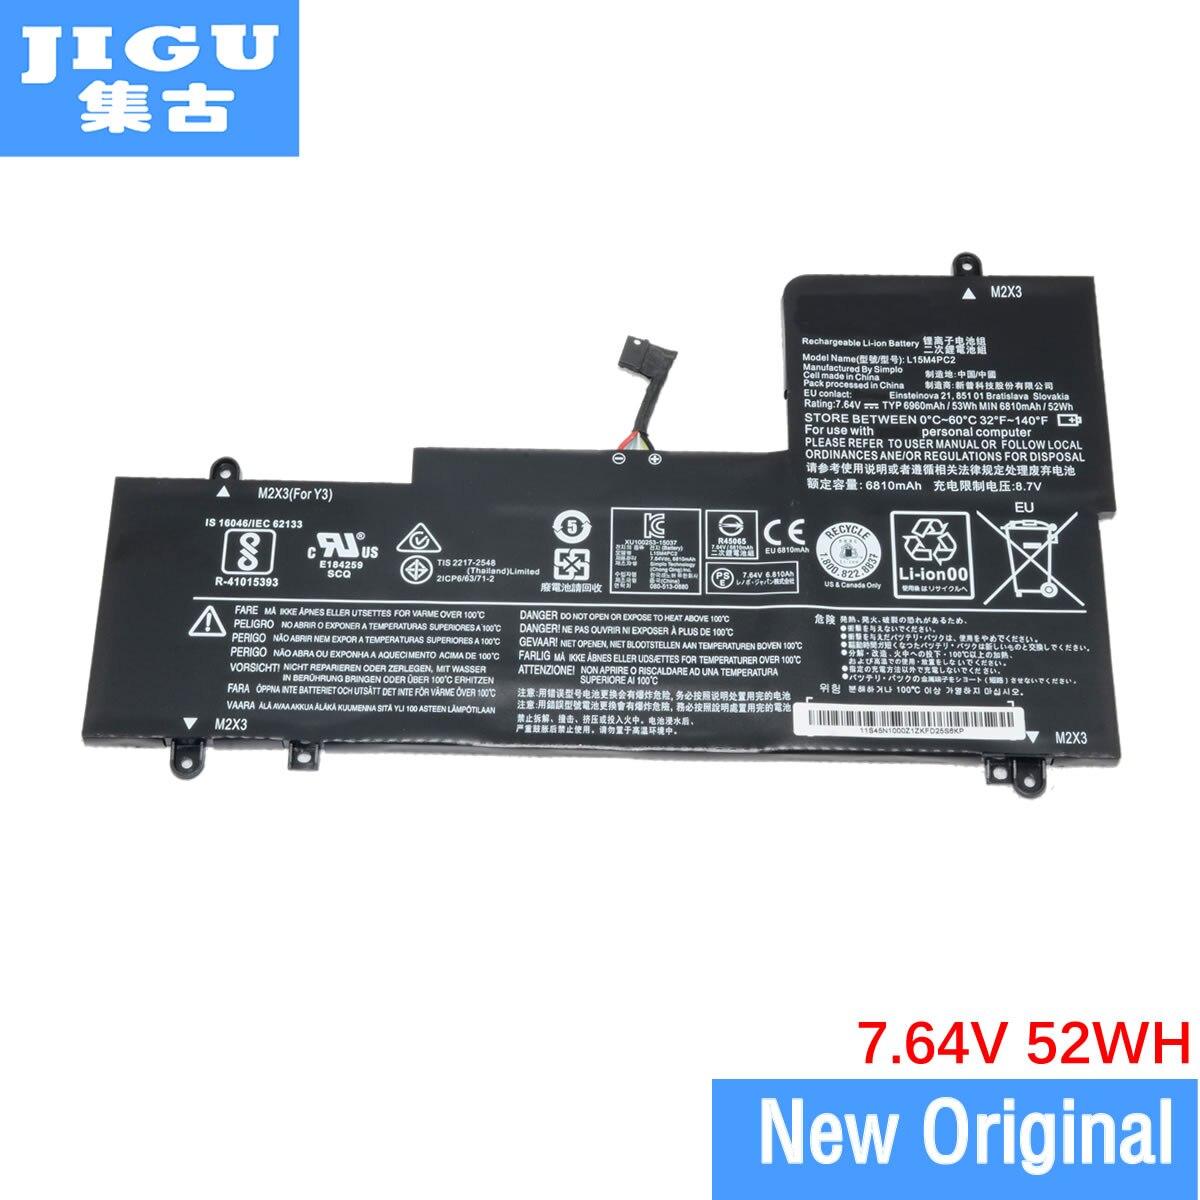 Batería Original JIGU para ordenador portátil 5B10K90802 L15L4PC2 L15M4PC2 para Lenovo para Yoga 710 7,64 V 52WH